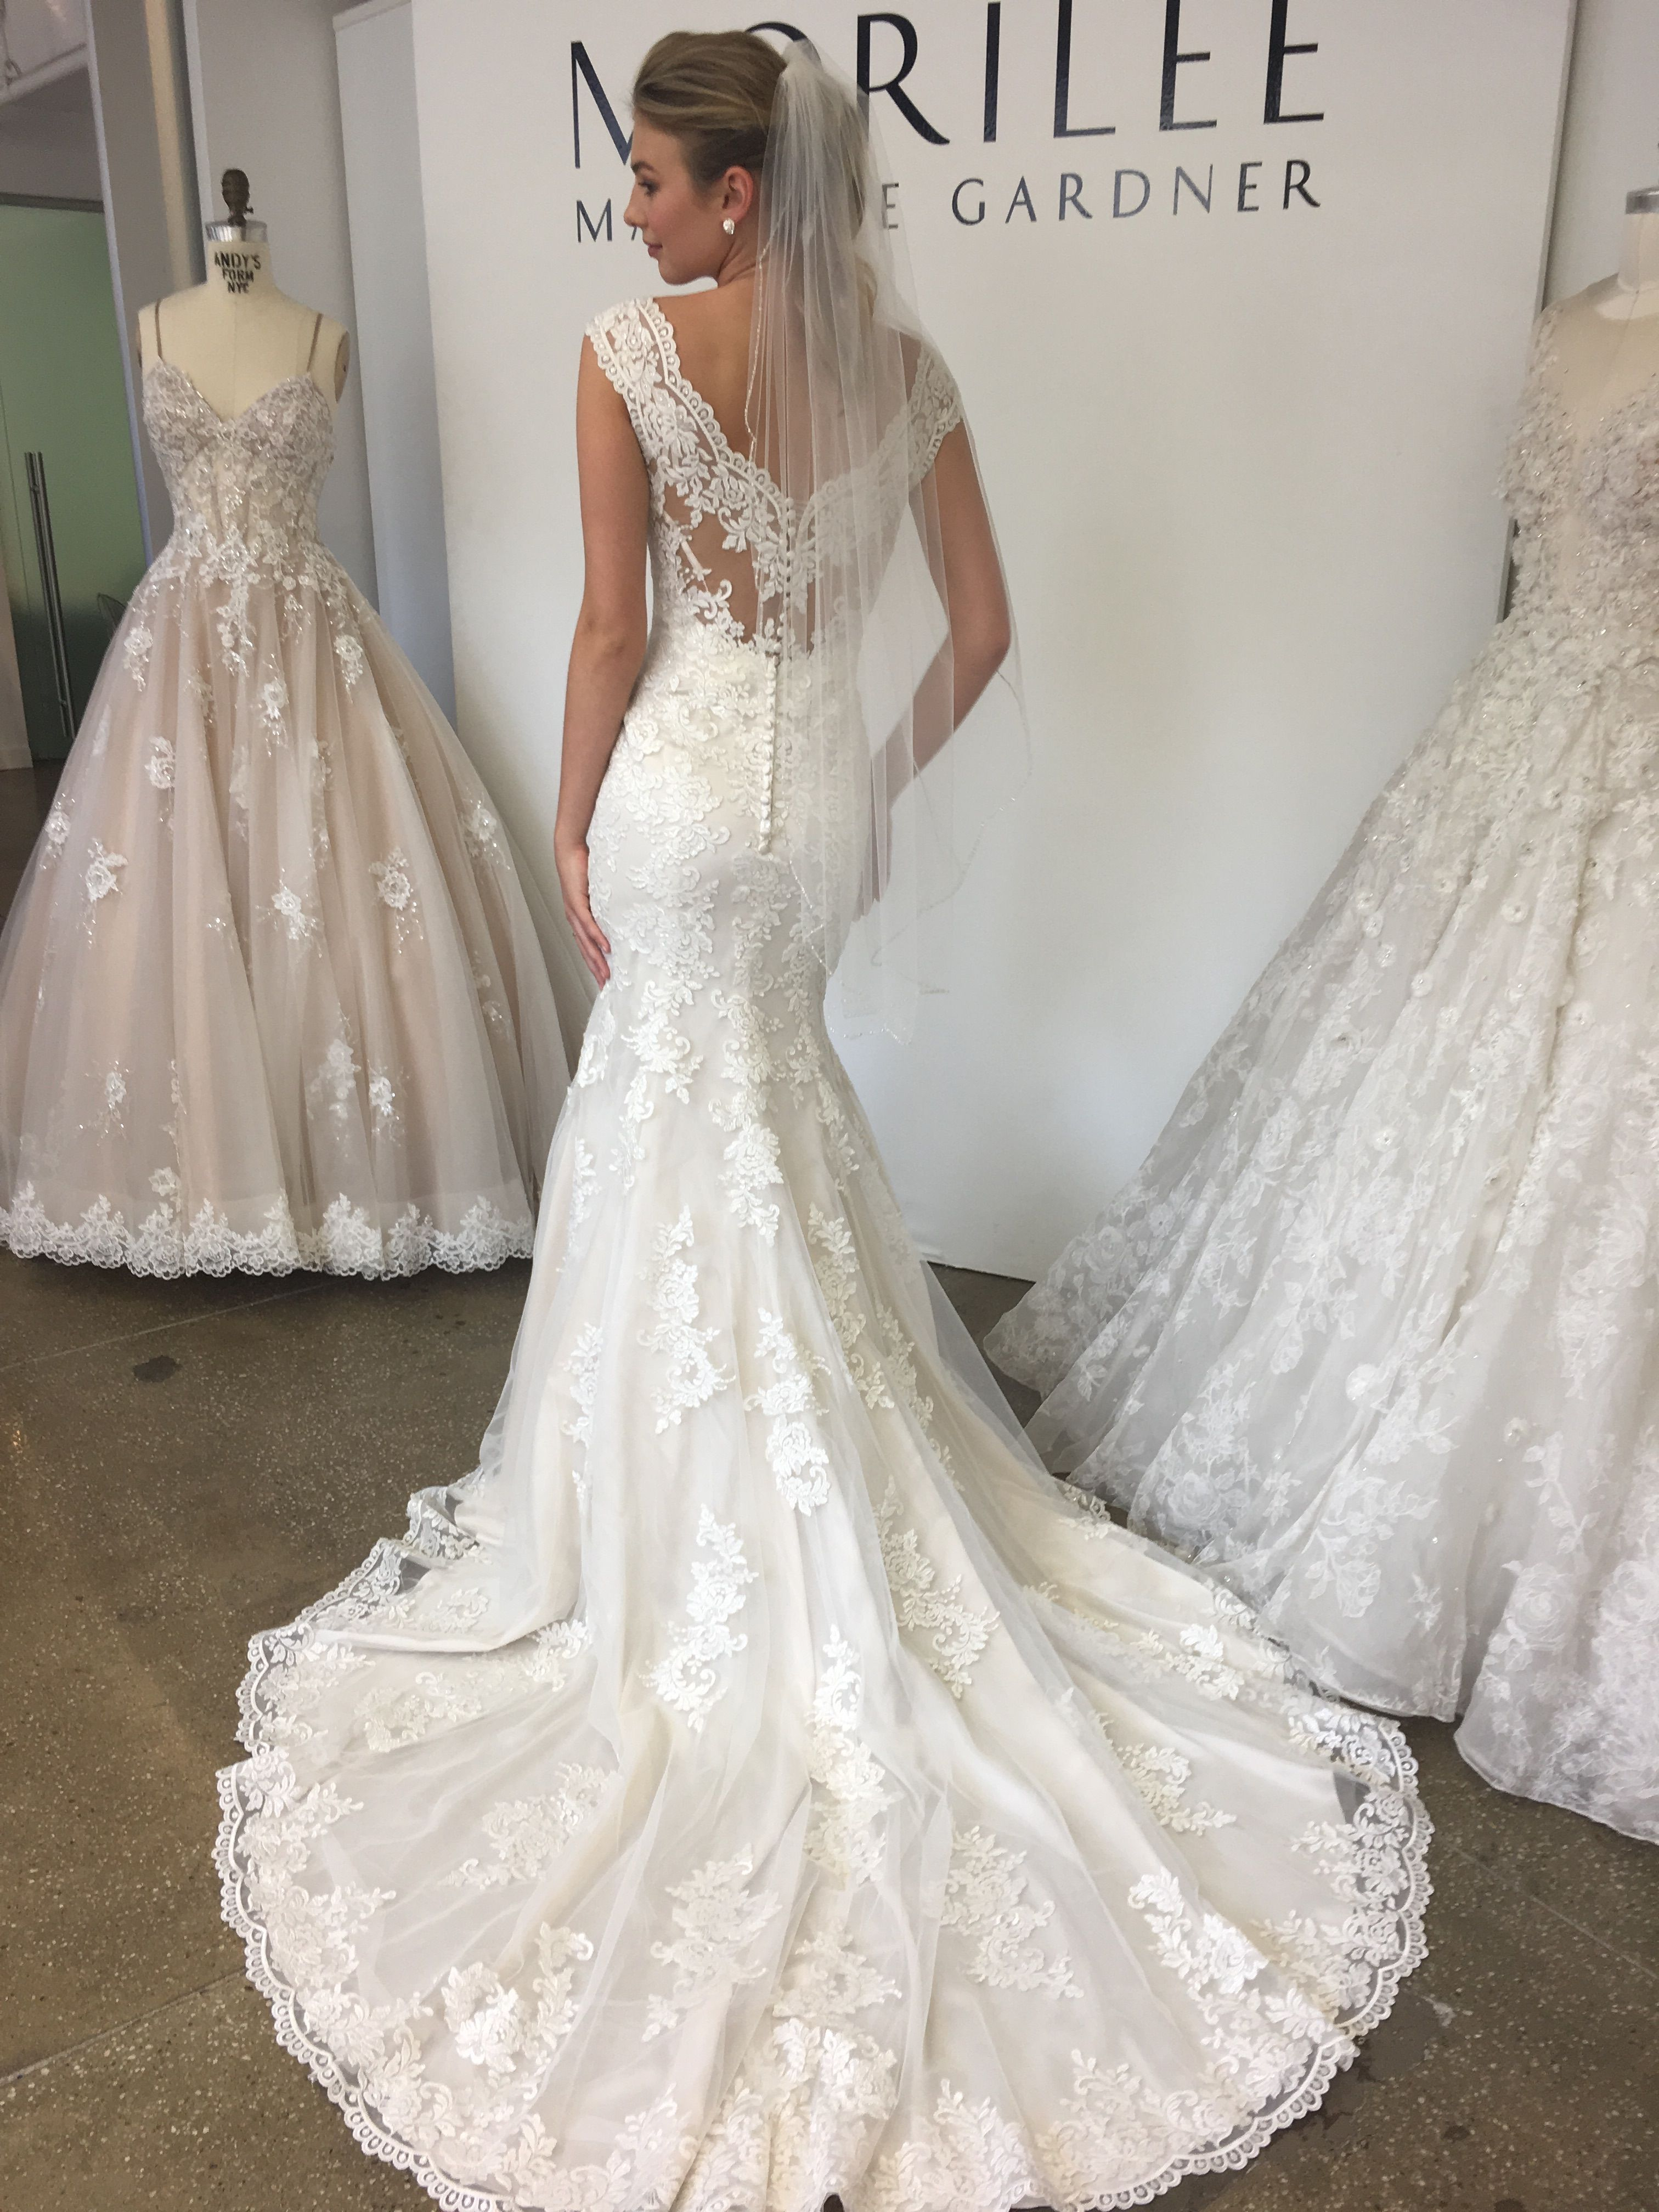 Monet Wedding Dress Morilee Wedding Dresses Stylish Wedding Dresses Fit And Flare Wedding Dress [ 4032 x 3024 Pixel ]